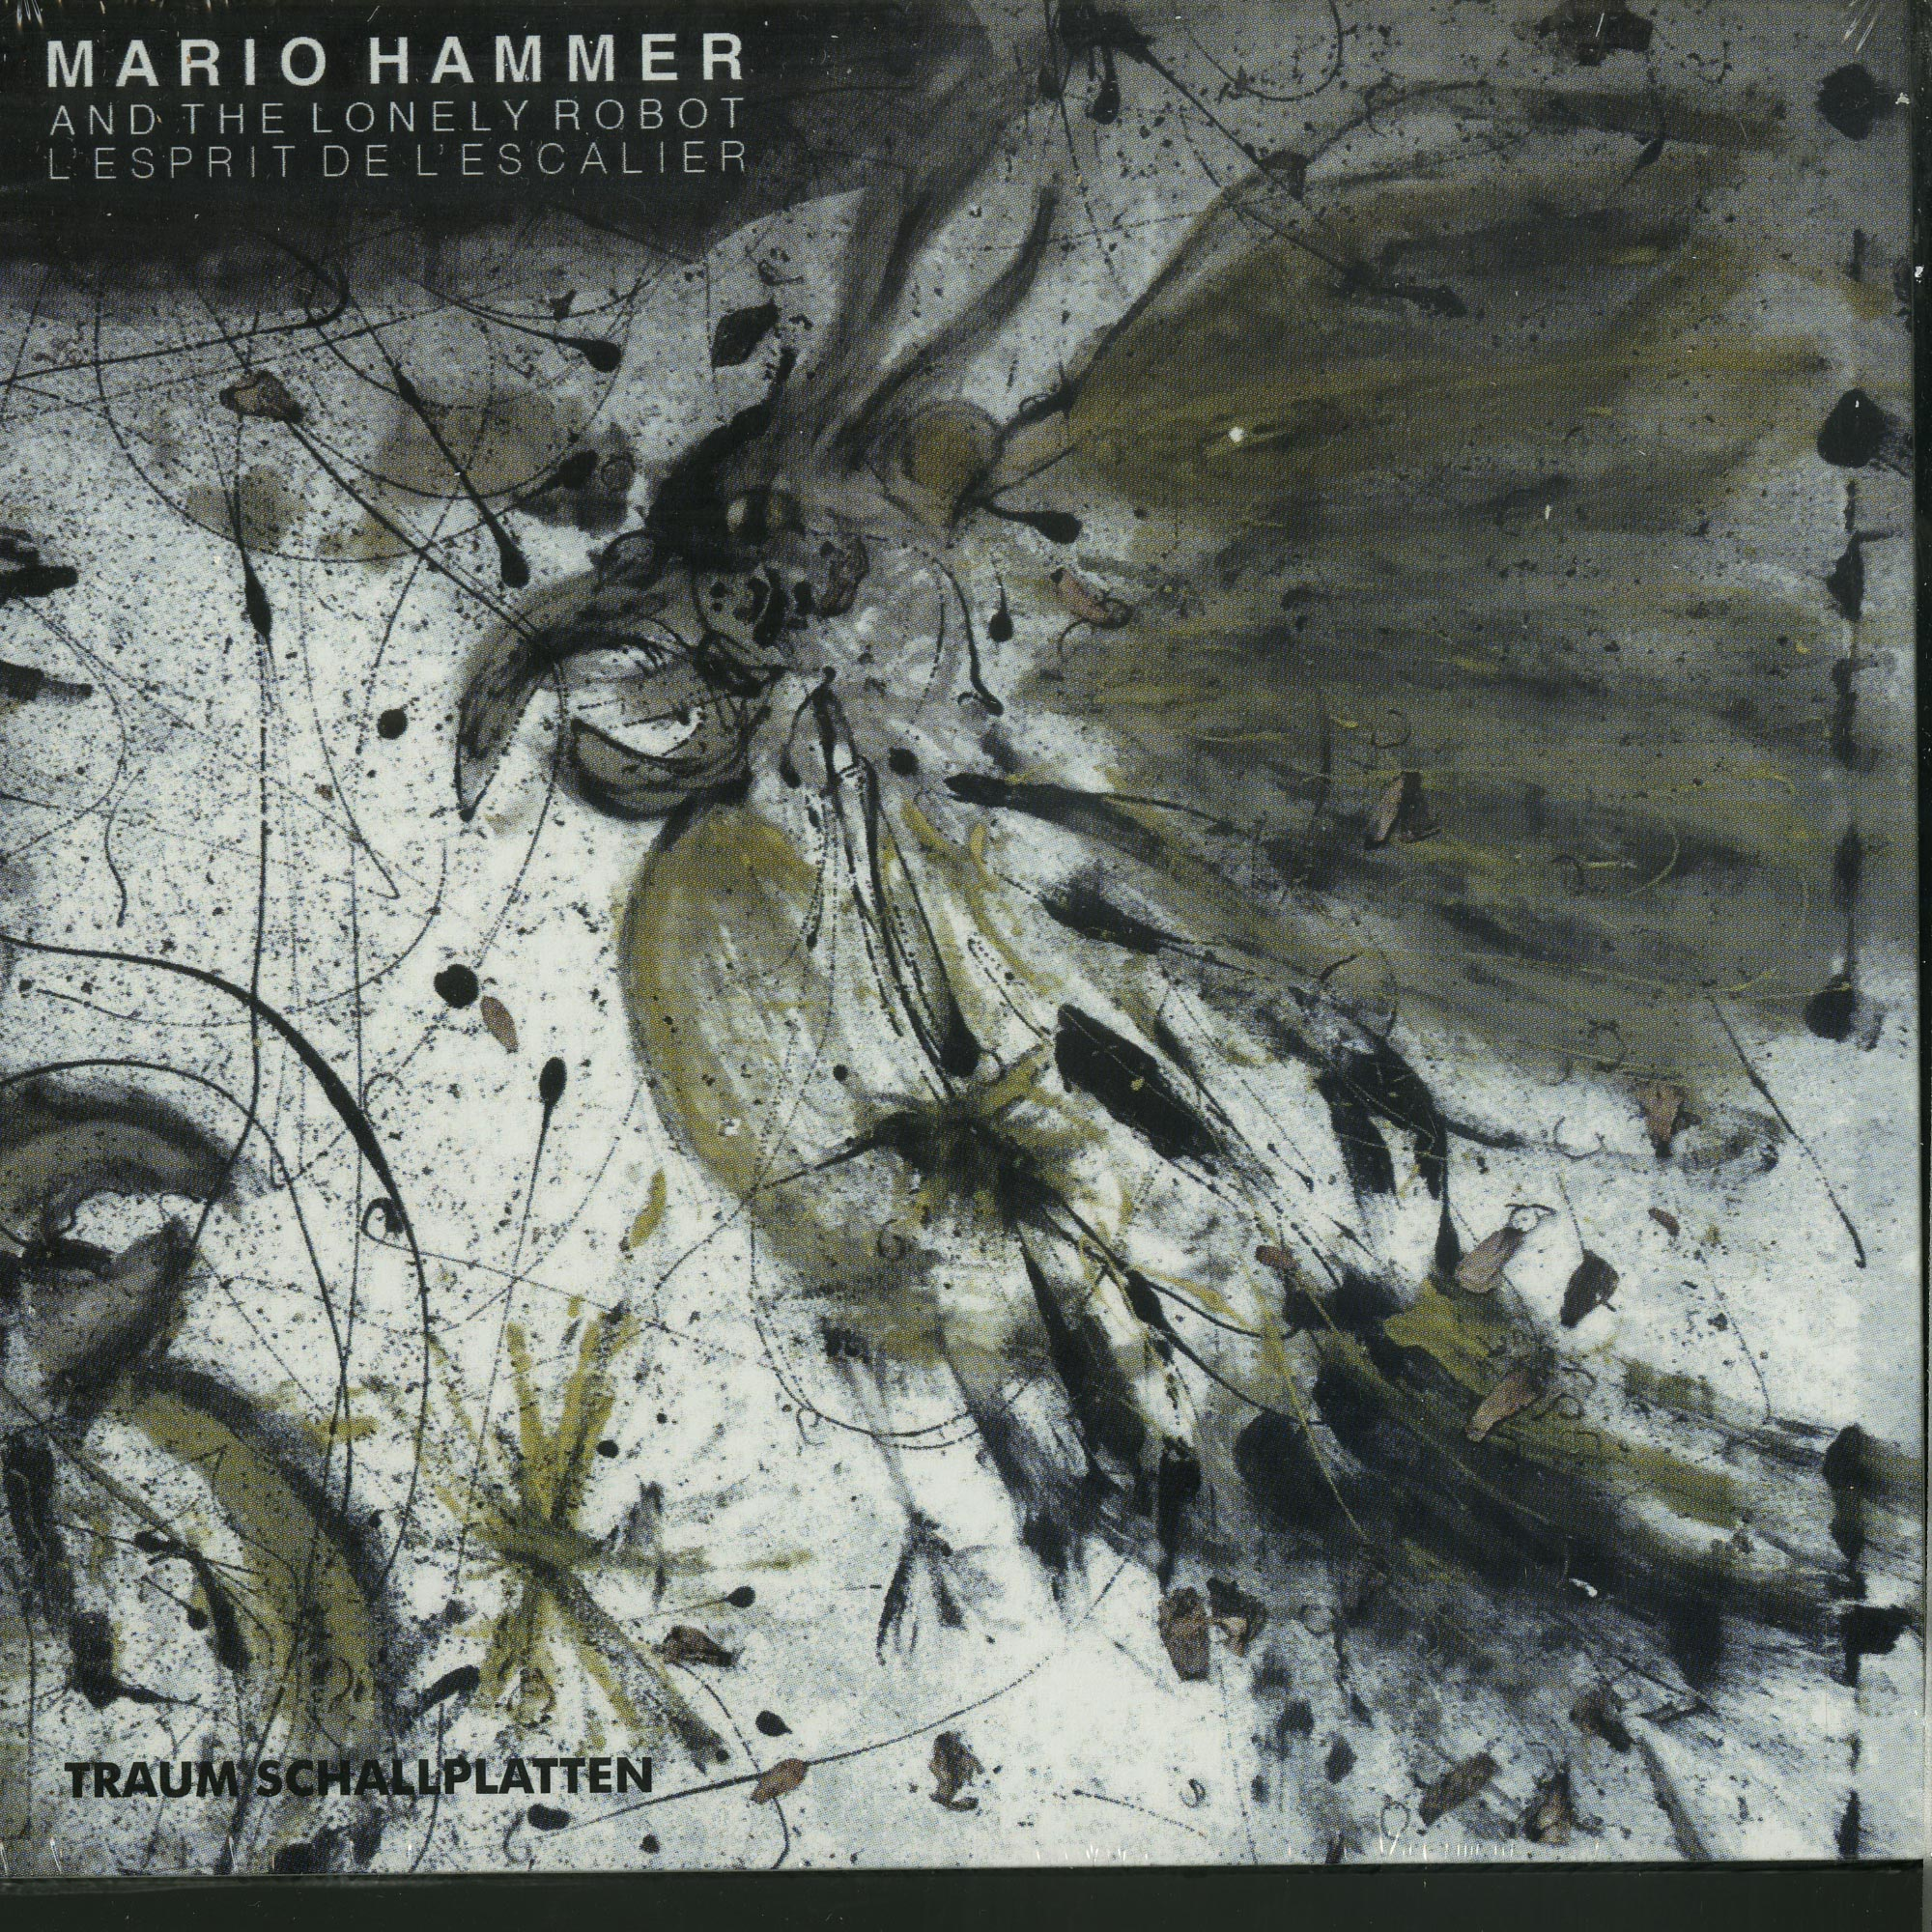 Mario Hammer And The Lonely Robot - LESPRIT DE LESCALIER